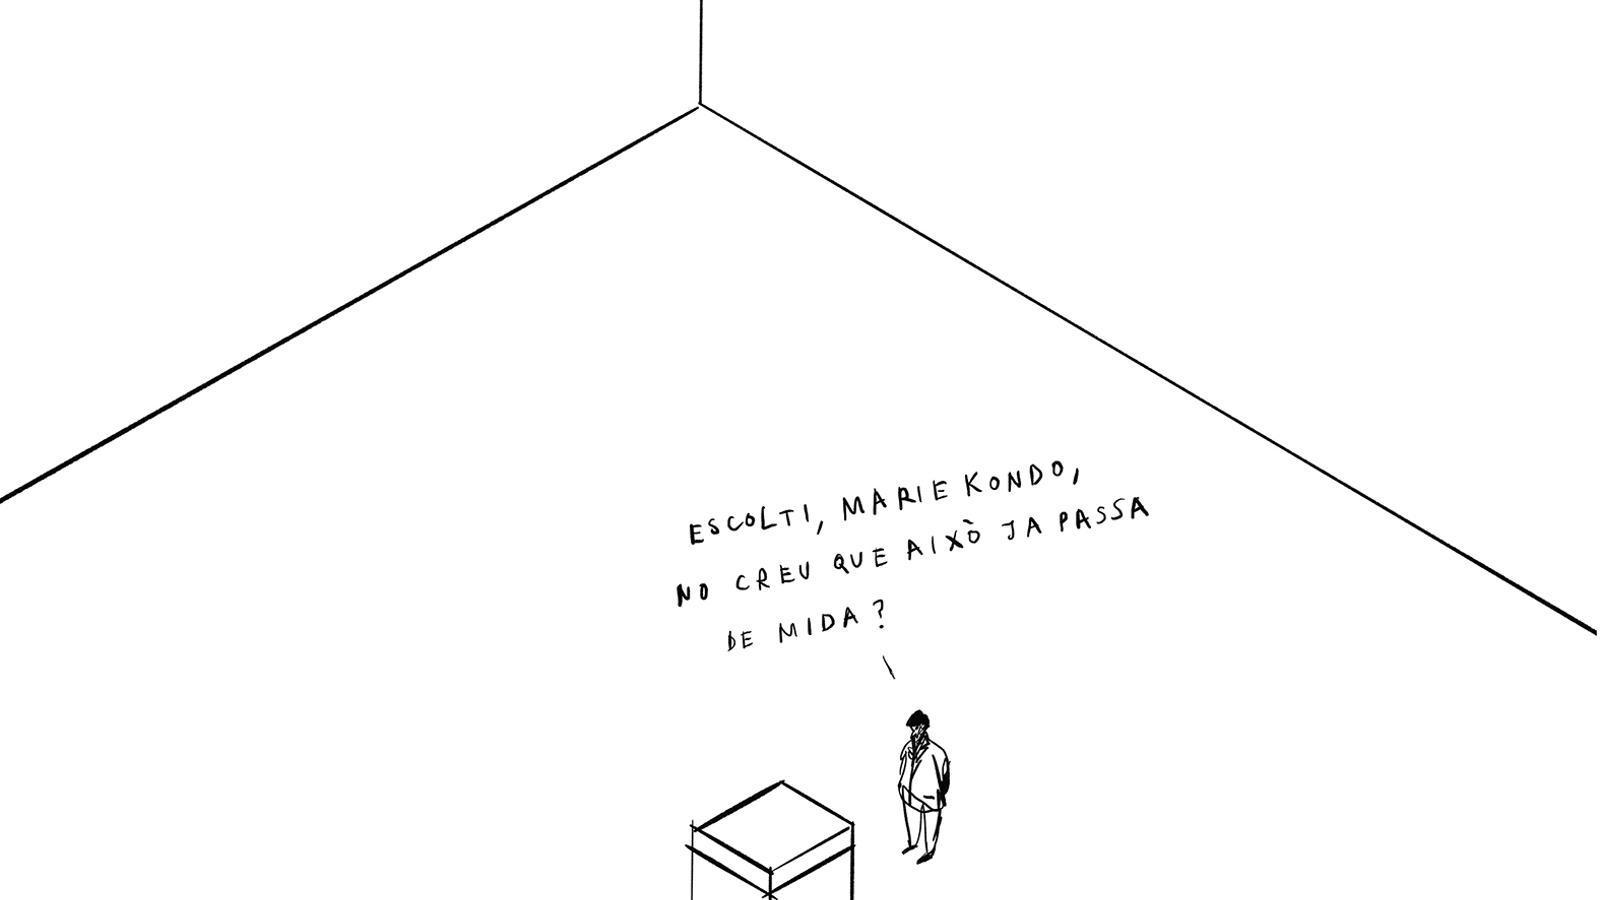 JO ENCARA DIRIA MENYS